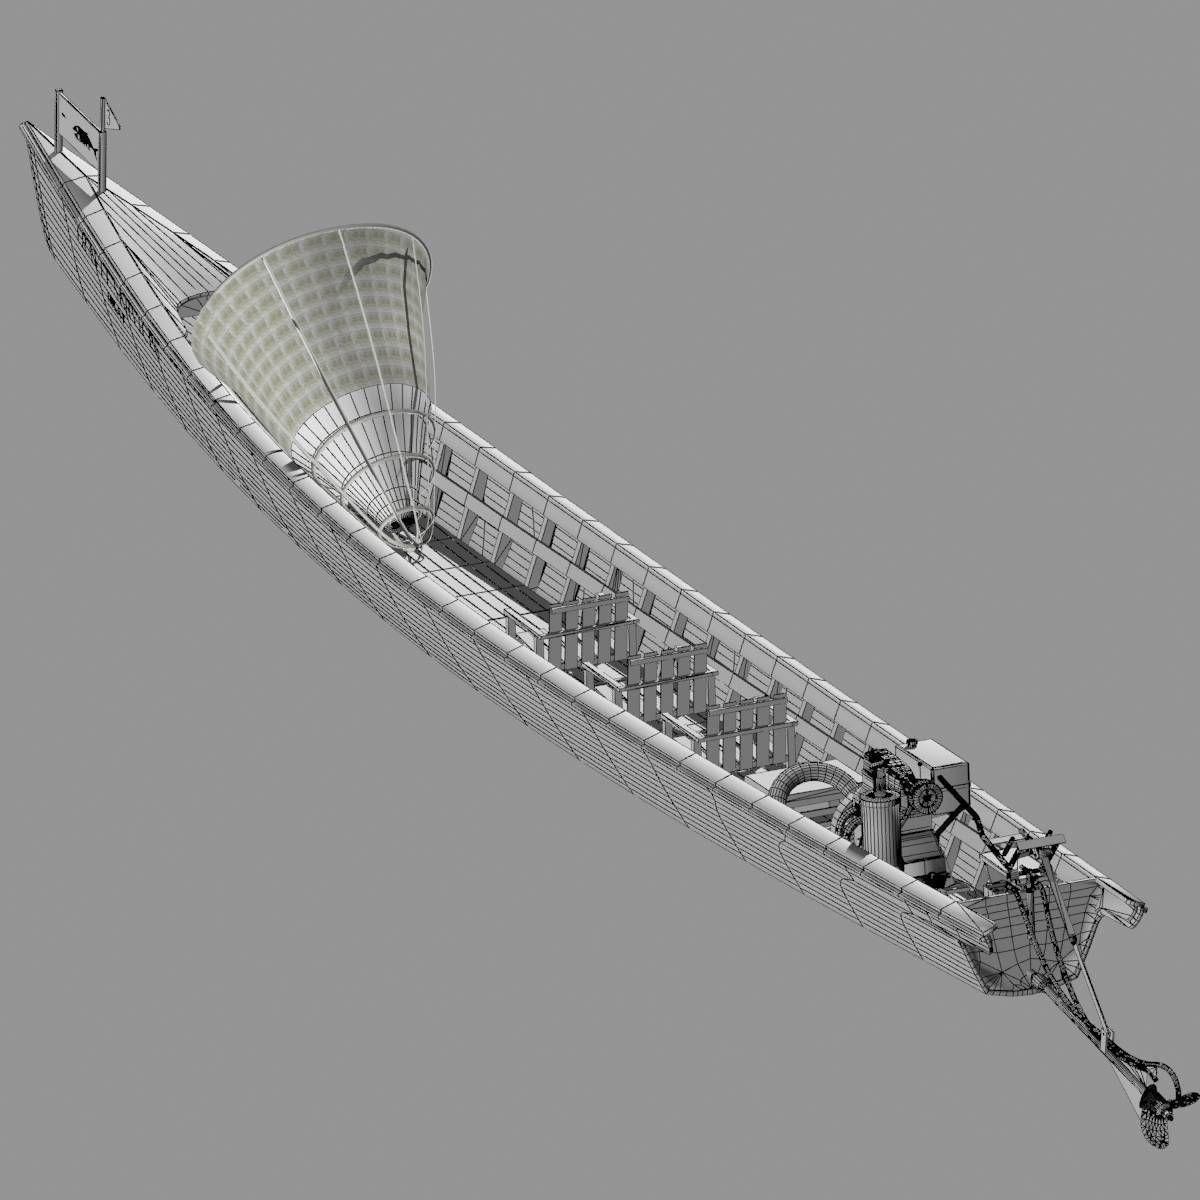 3D model Inle Lake Motor Canoe VR / AR / low-poly MAX OBJ